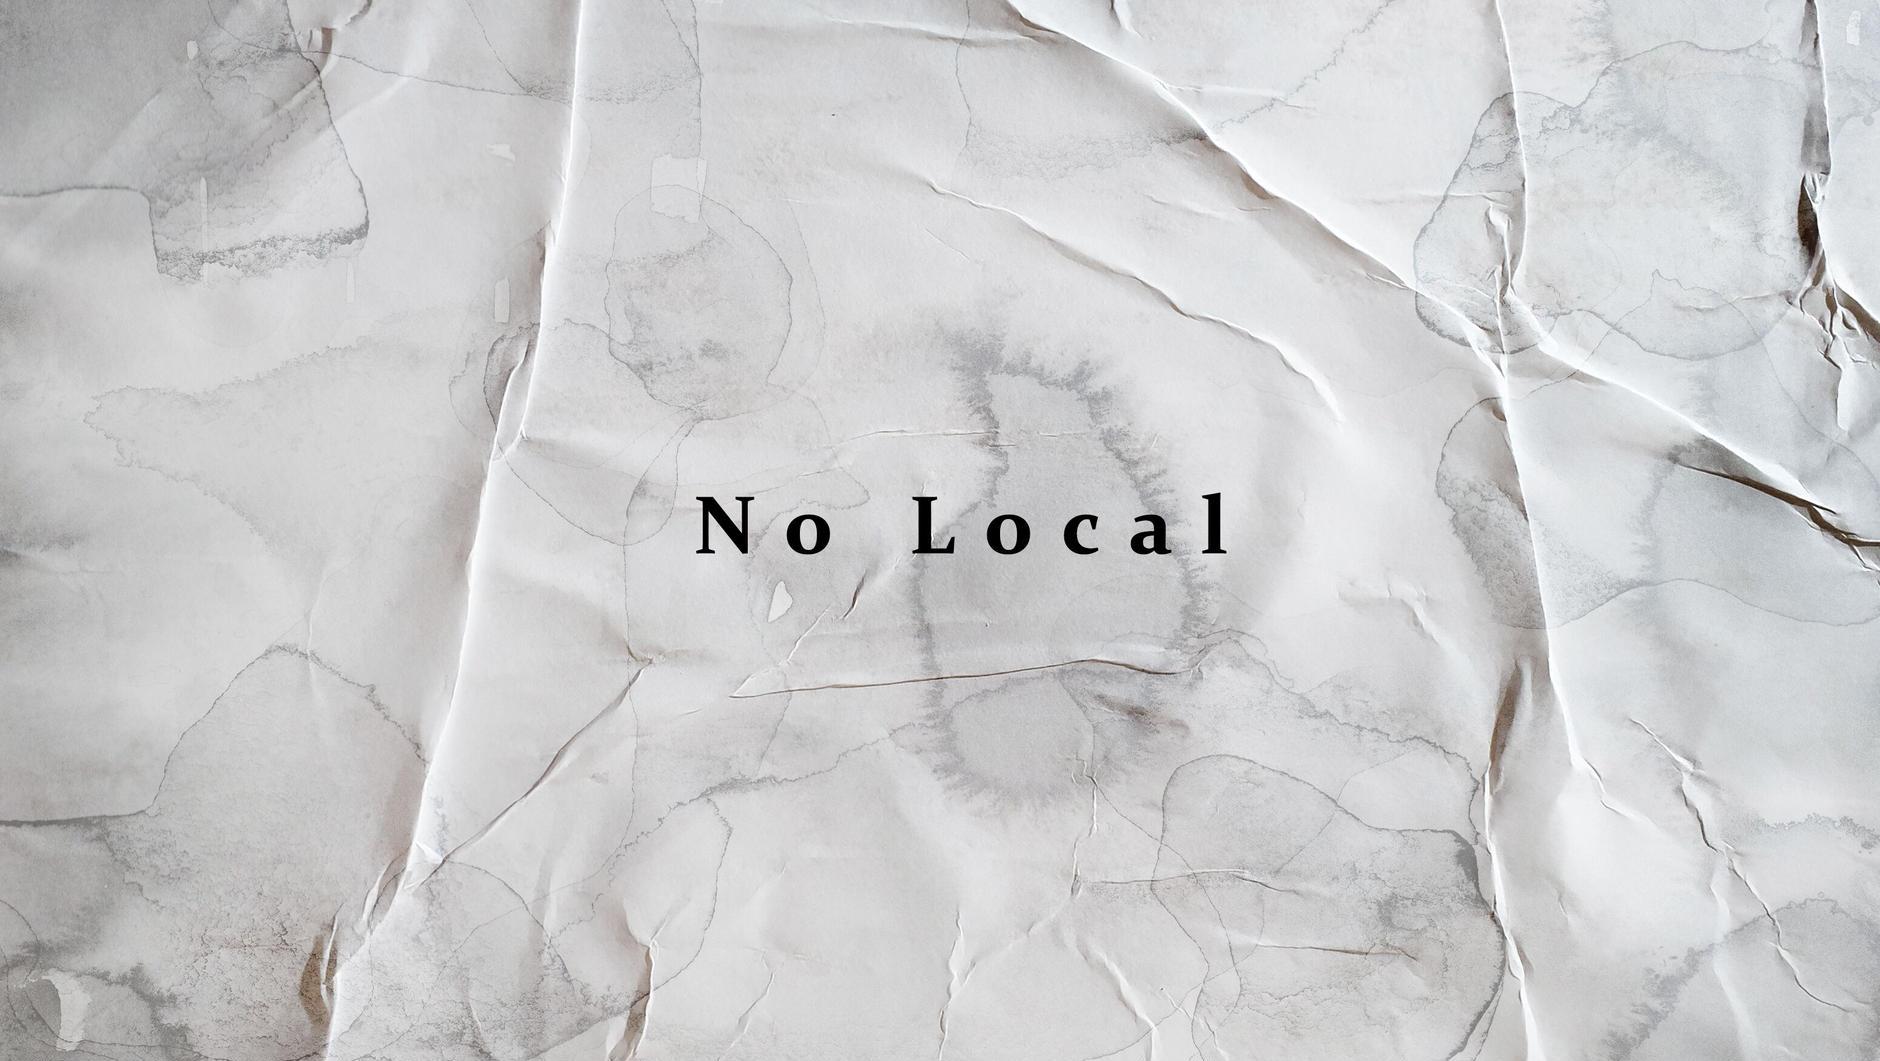 No Local